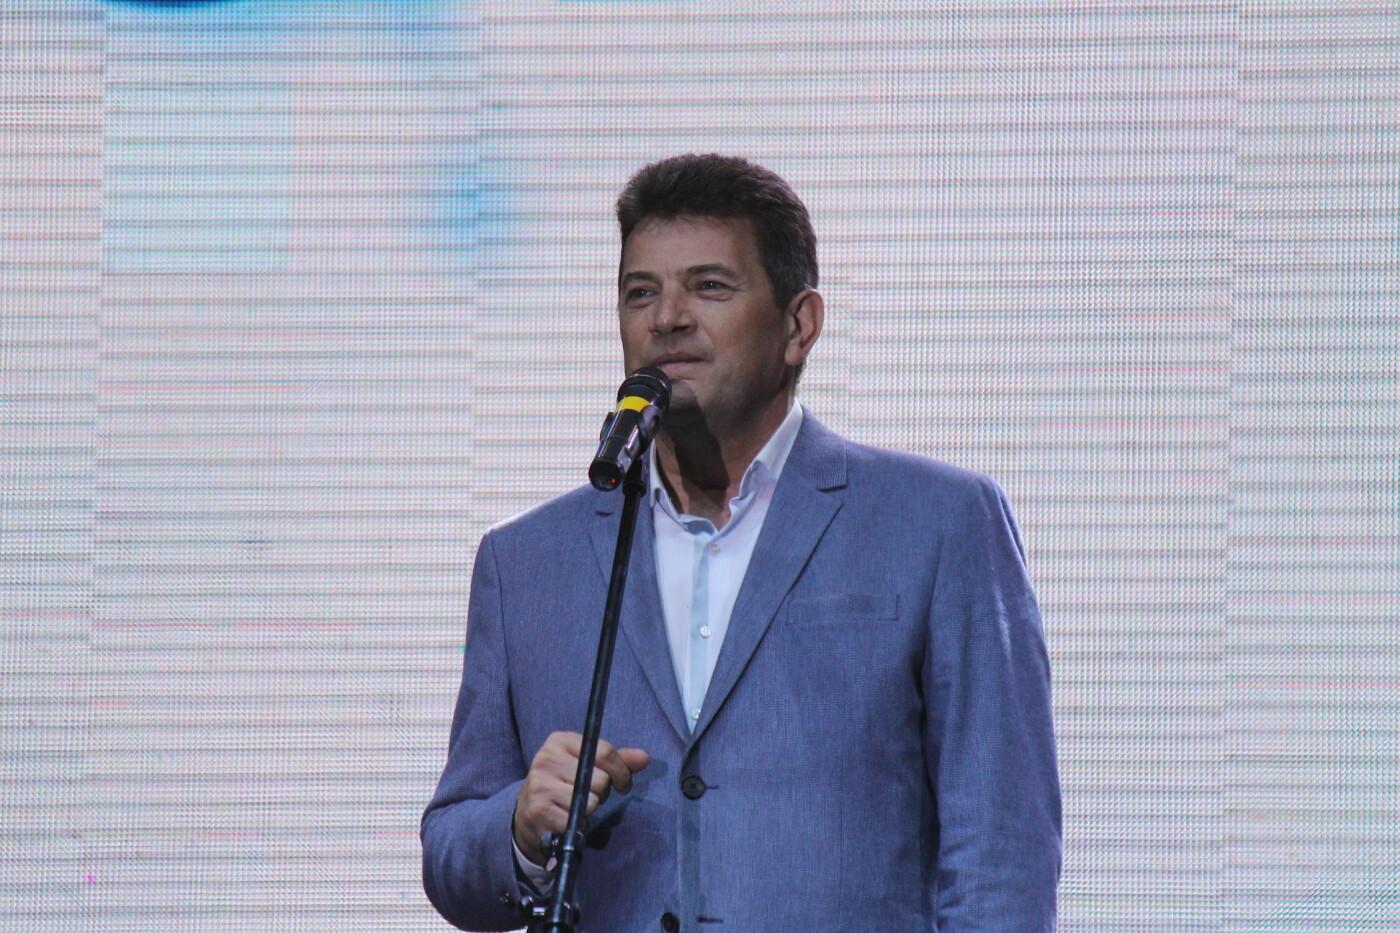 Мэр Владимир Буряк и его команда поздравили горожан с Днем металлурга, фото-1